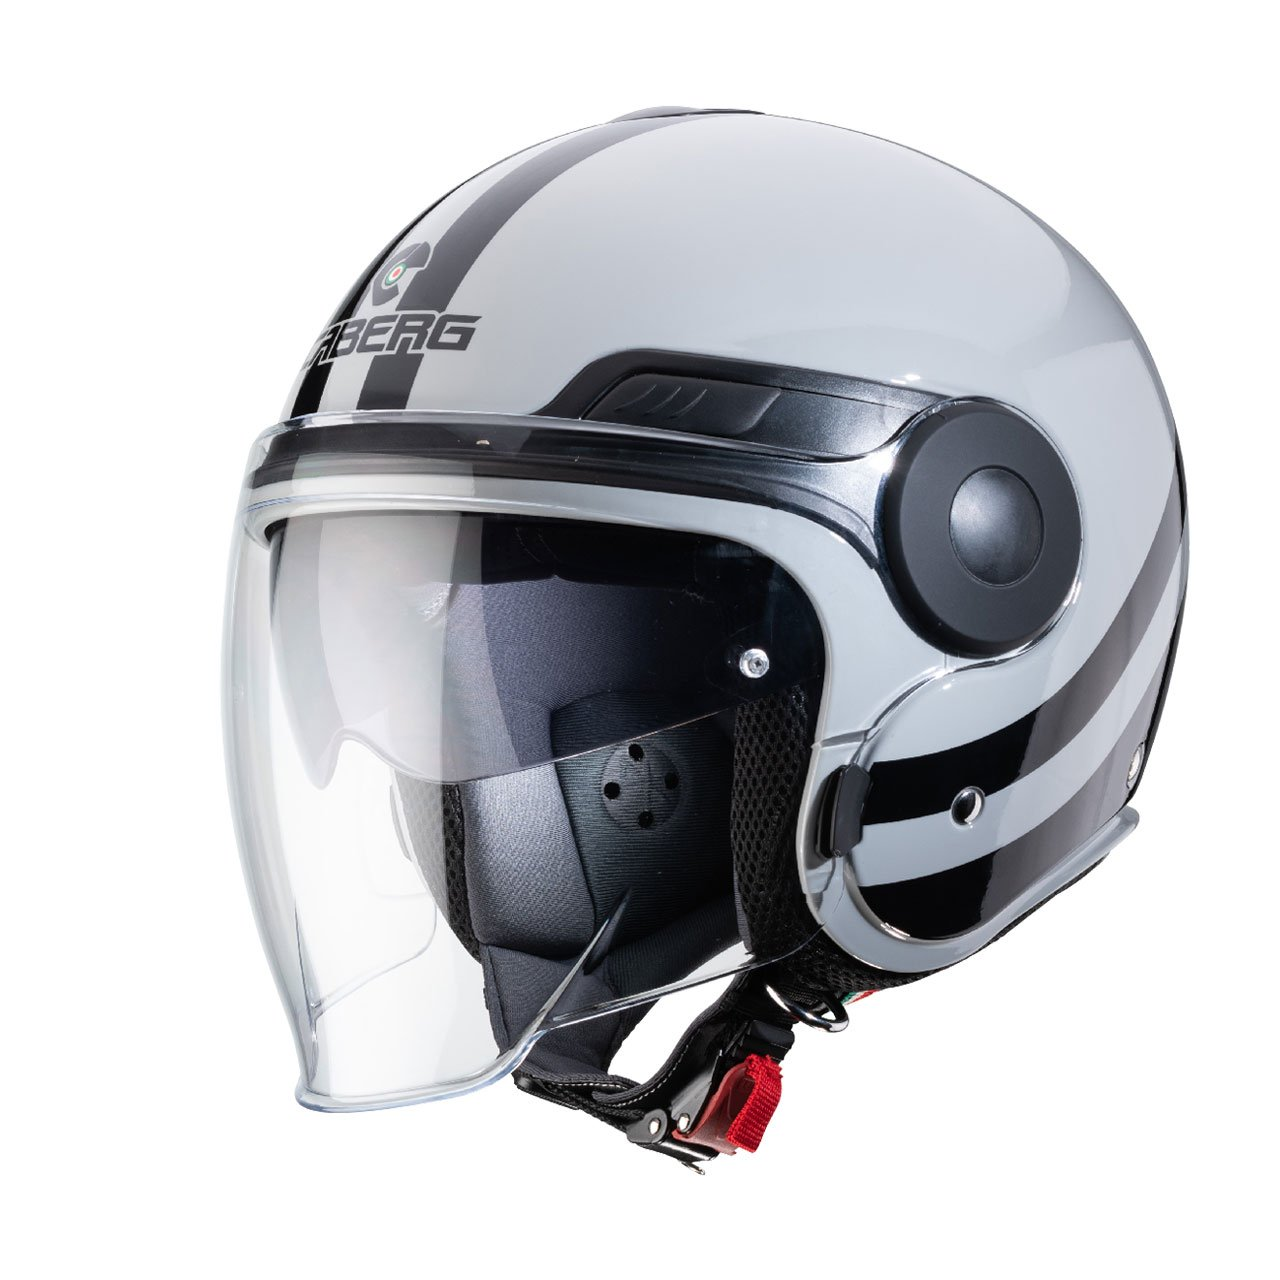 Caberg Uptown Chrono Jet Helmet